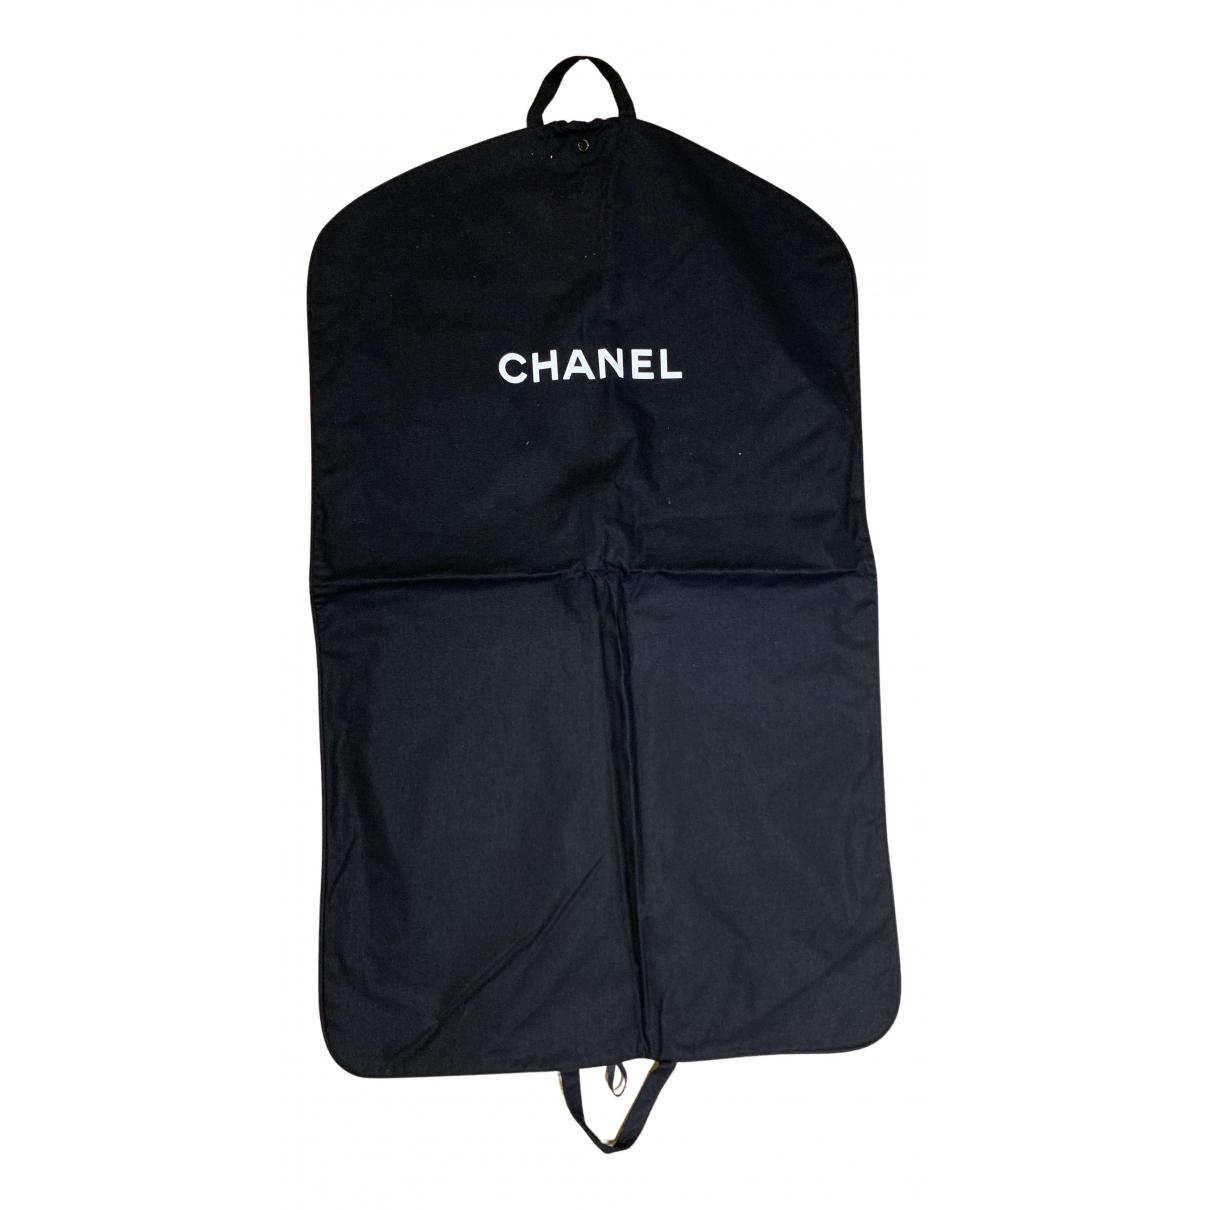 Chanel Timeless/Classique travel bag